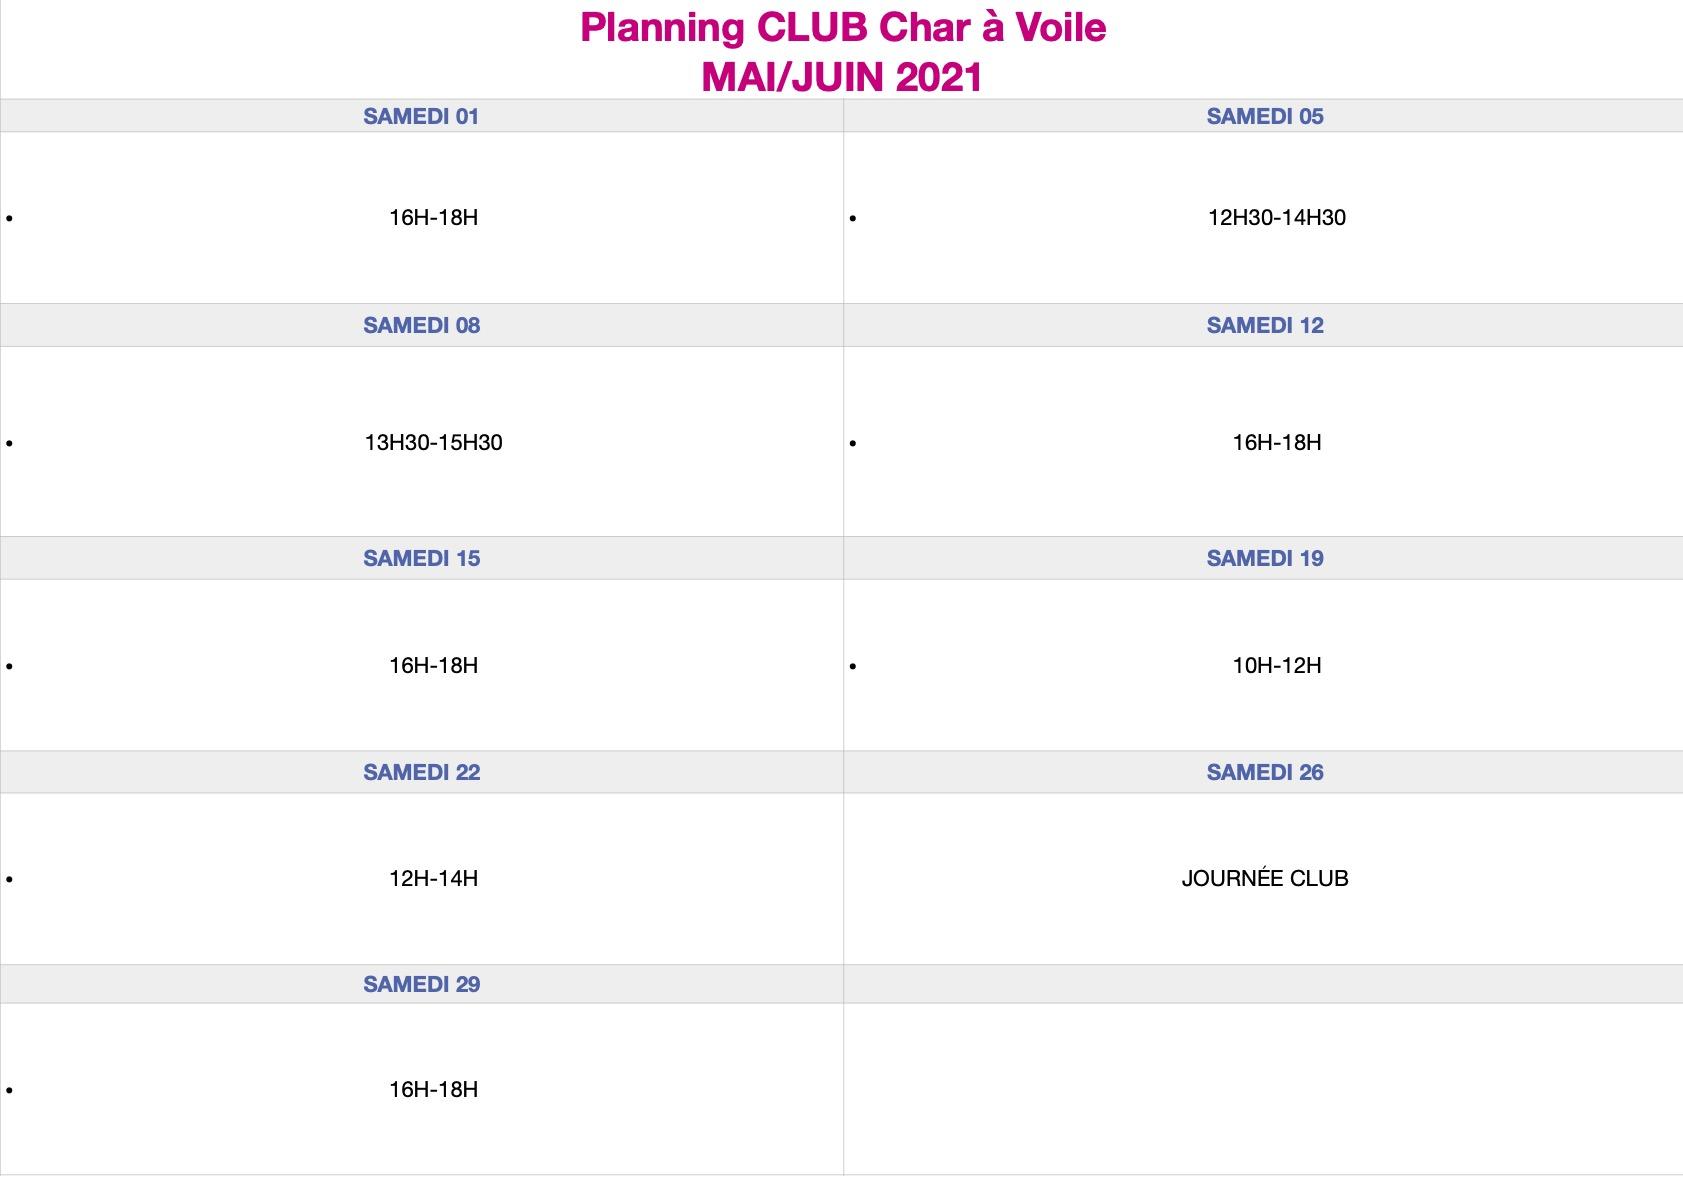 Planning Club CÀV 05-06_21 jpeg.jpg